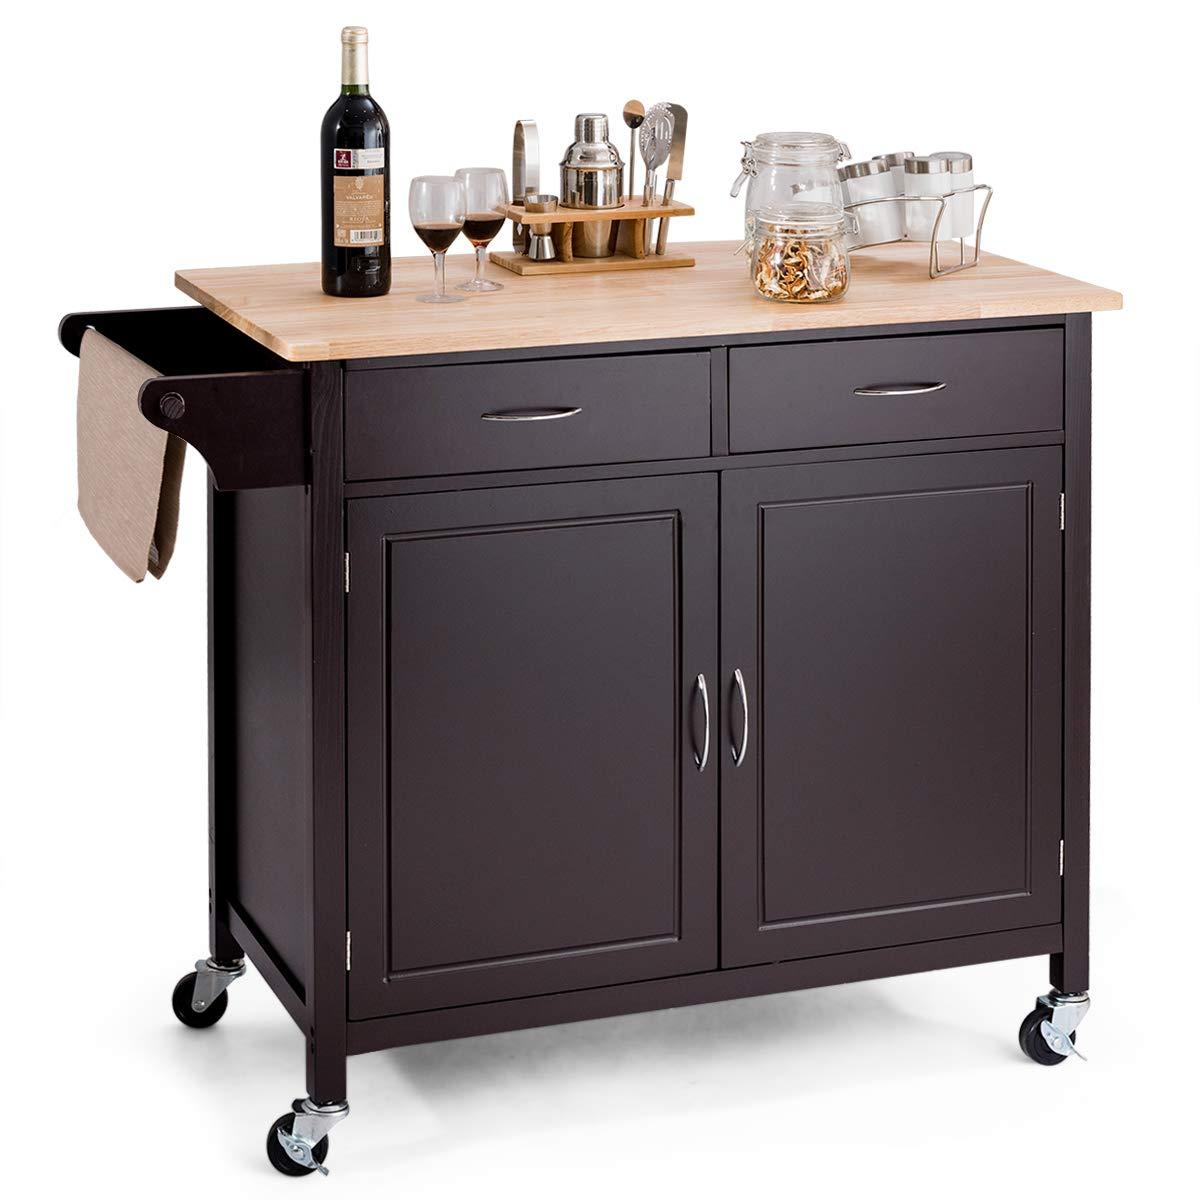 Giantex Portable Kitchen Rolling Cart Wood Top Island Serving Utility W/Cabinet &Drawer (Dark Brown)